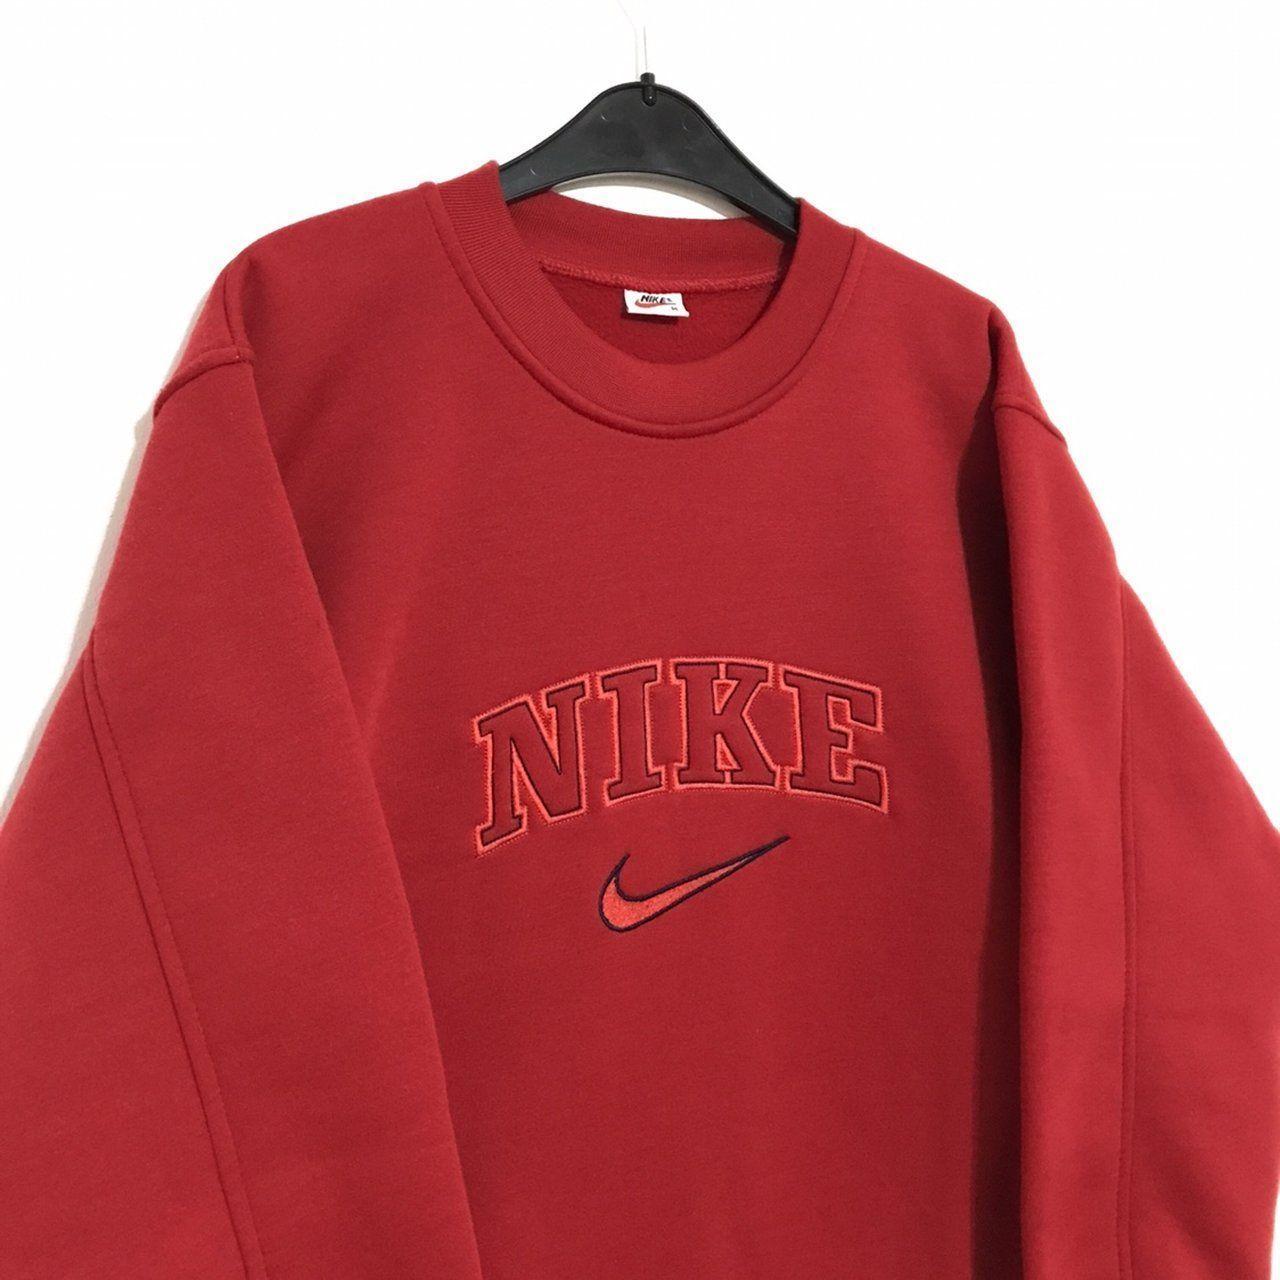 Vintage Nike Sweatshirt Size M Great Condition To Pit To To Depop Vintagecrewnecksweatshirt Sweaterhoo In 2020 Vintage Nike Sweatshirt Vintage Hoodies Retro Outfits [ 1280 x 1280 Pixel ]